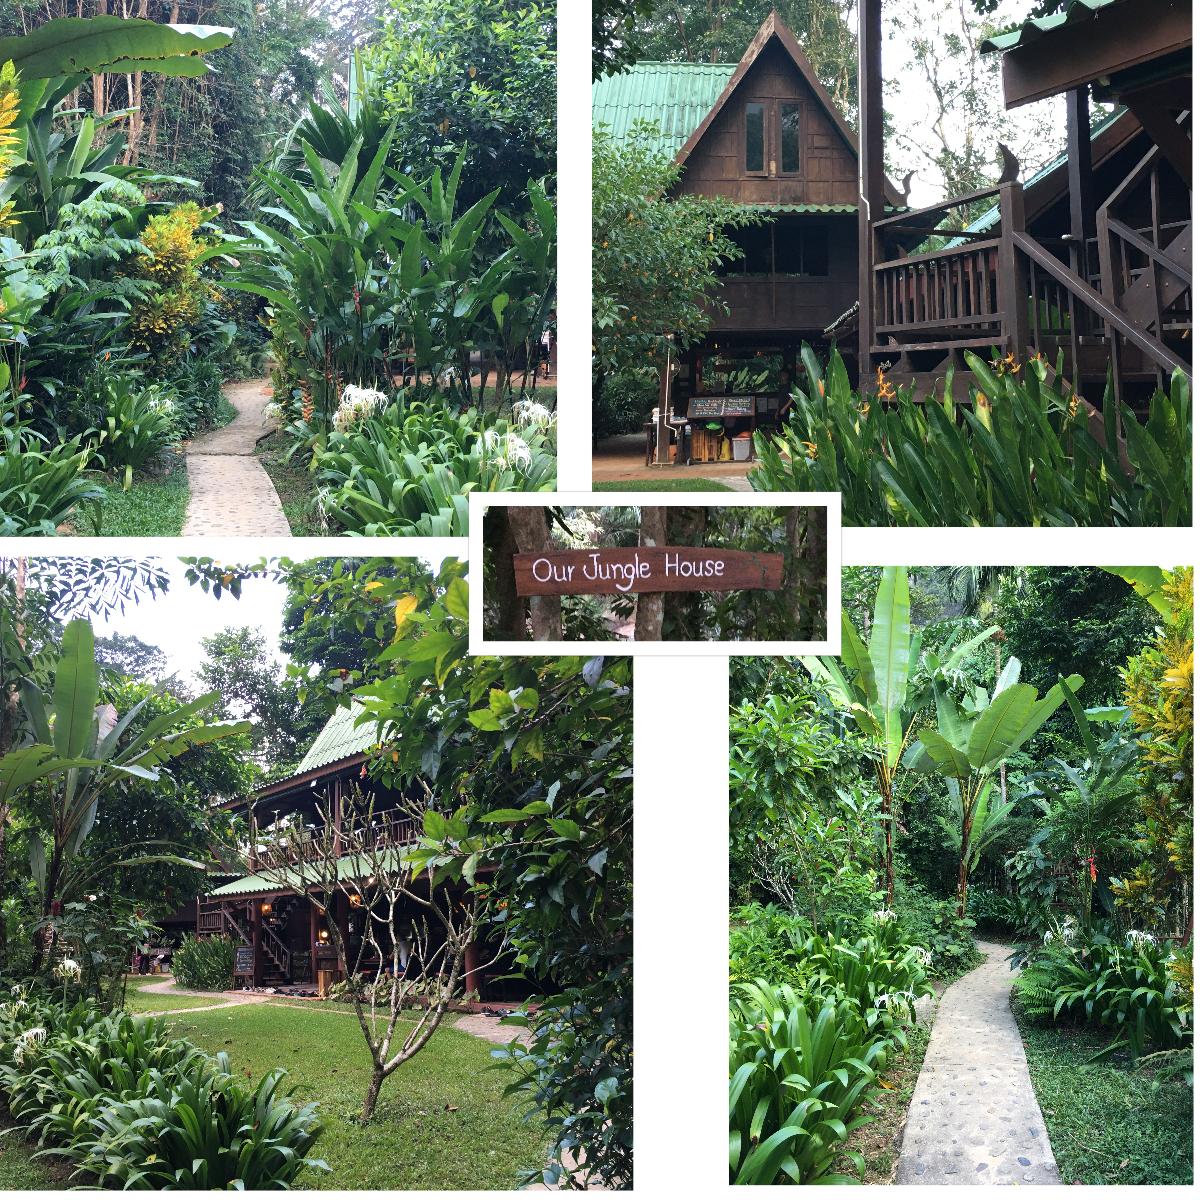 Our Jungle House Resort Khao Sok